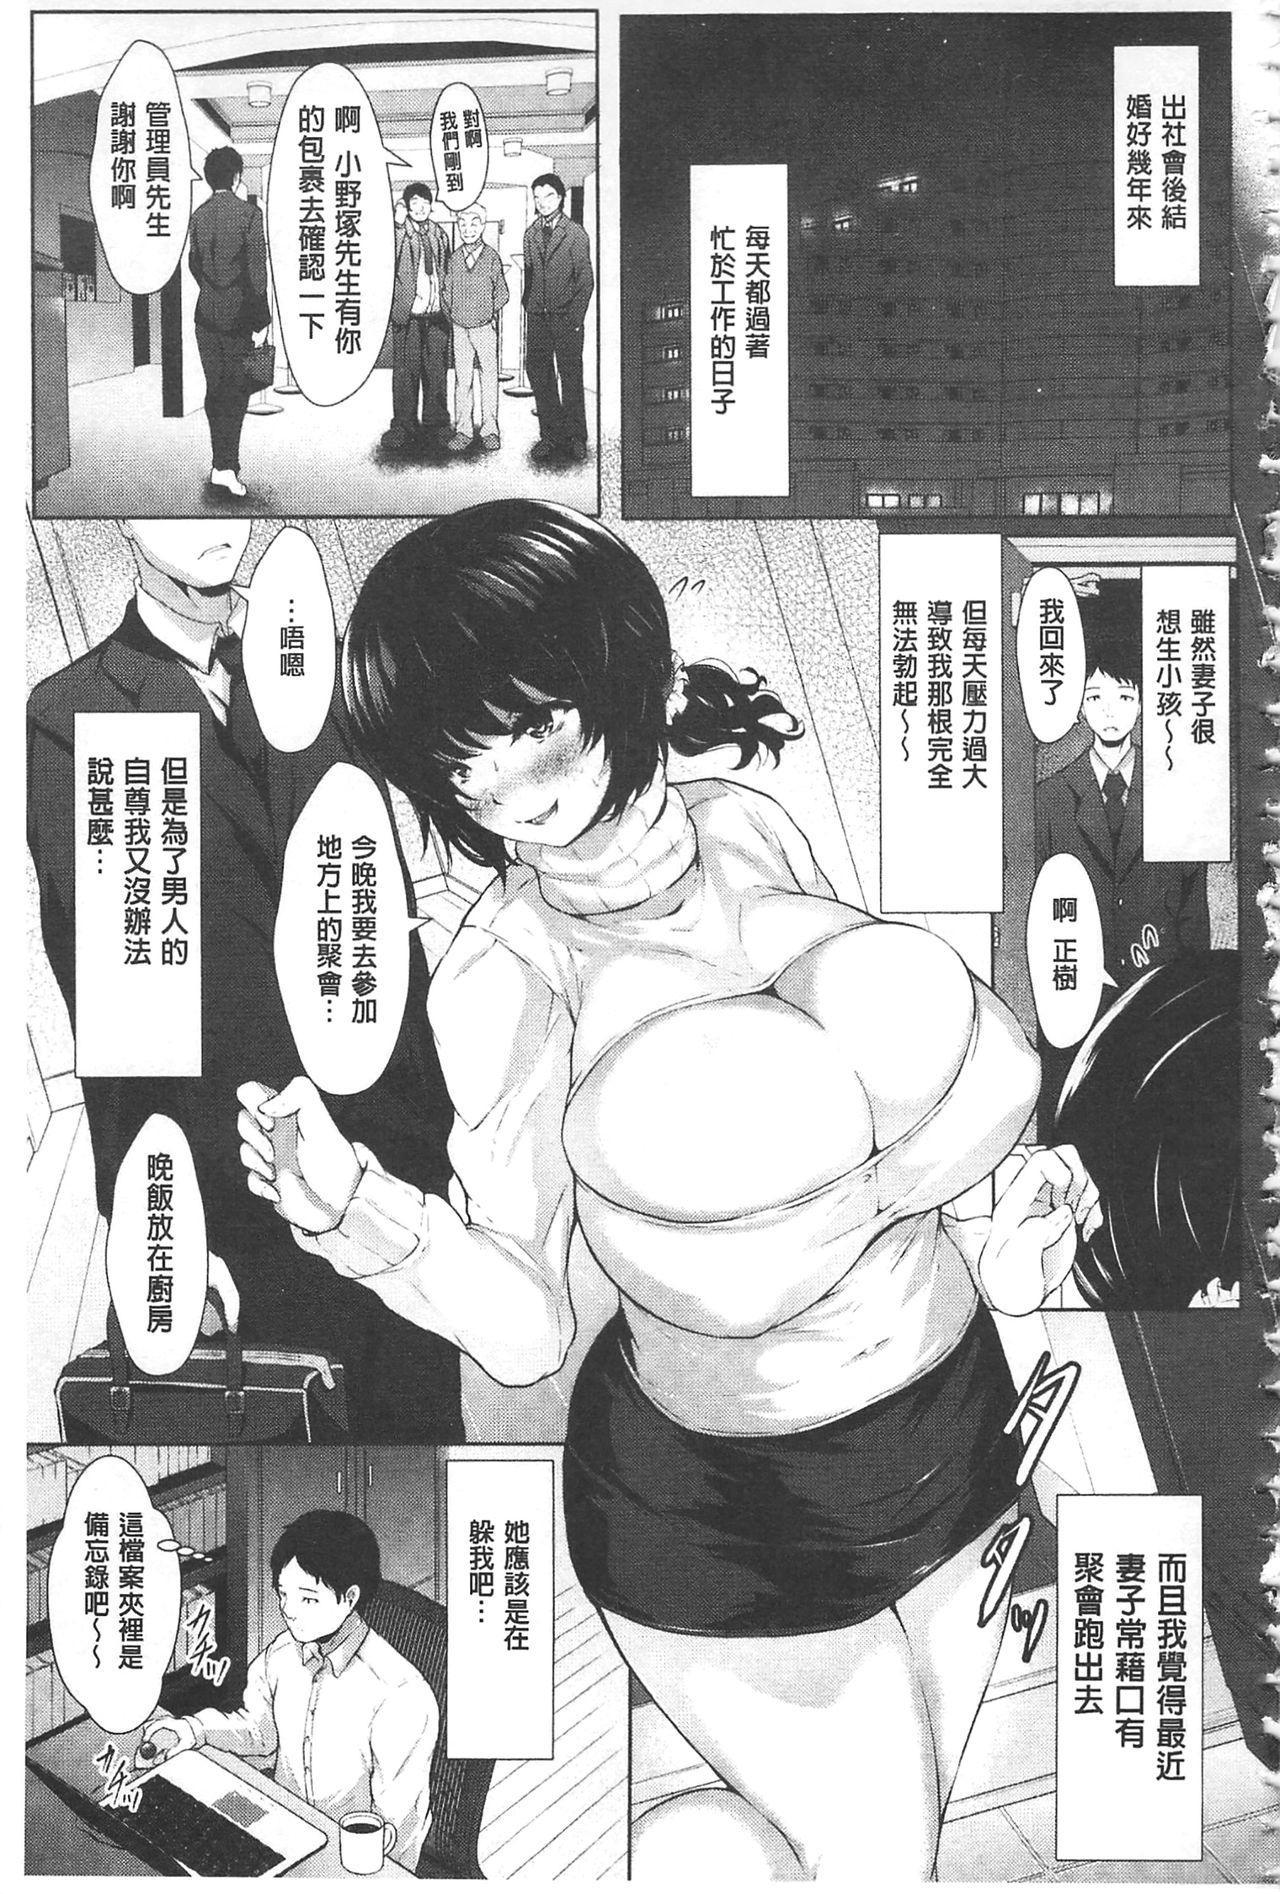 [Lorica] Biinkan Anal ~Kakusei Nejikomi Ana~ | 美淫感猥菊花 塞入擴張覺醒穴 [Chinese] 149